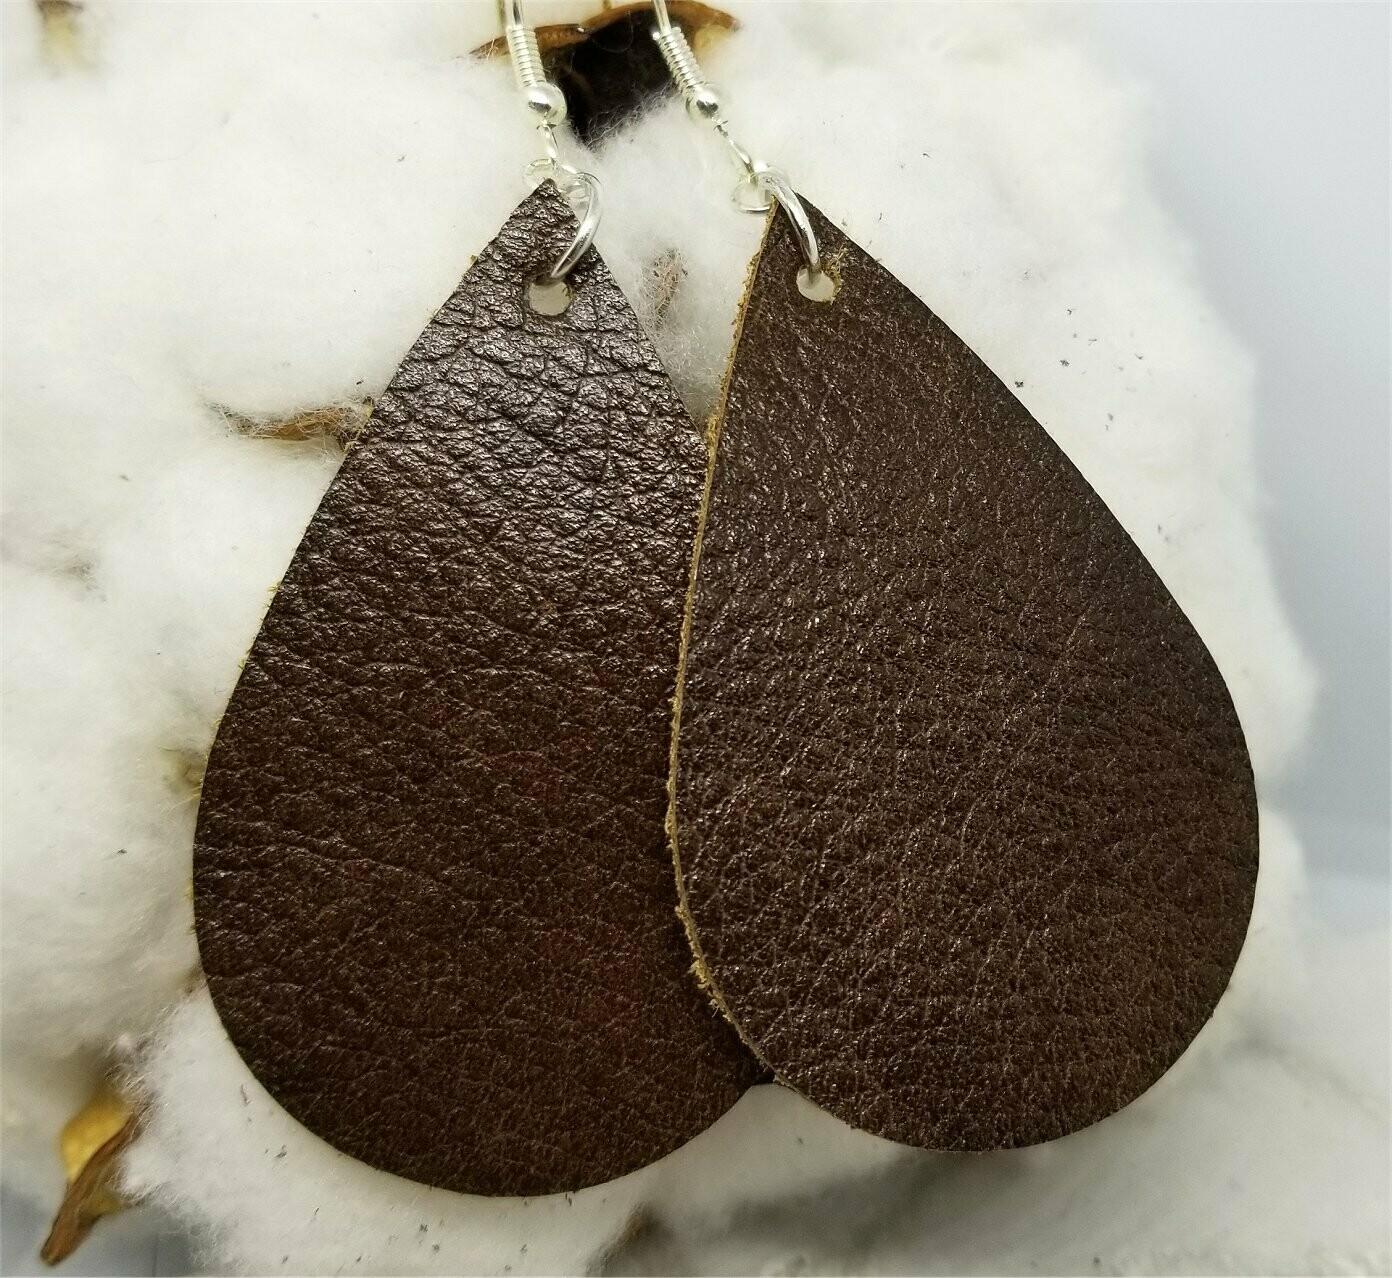 Brown Teardrop Shaped Real Leather Earrings